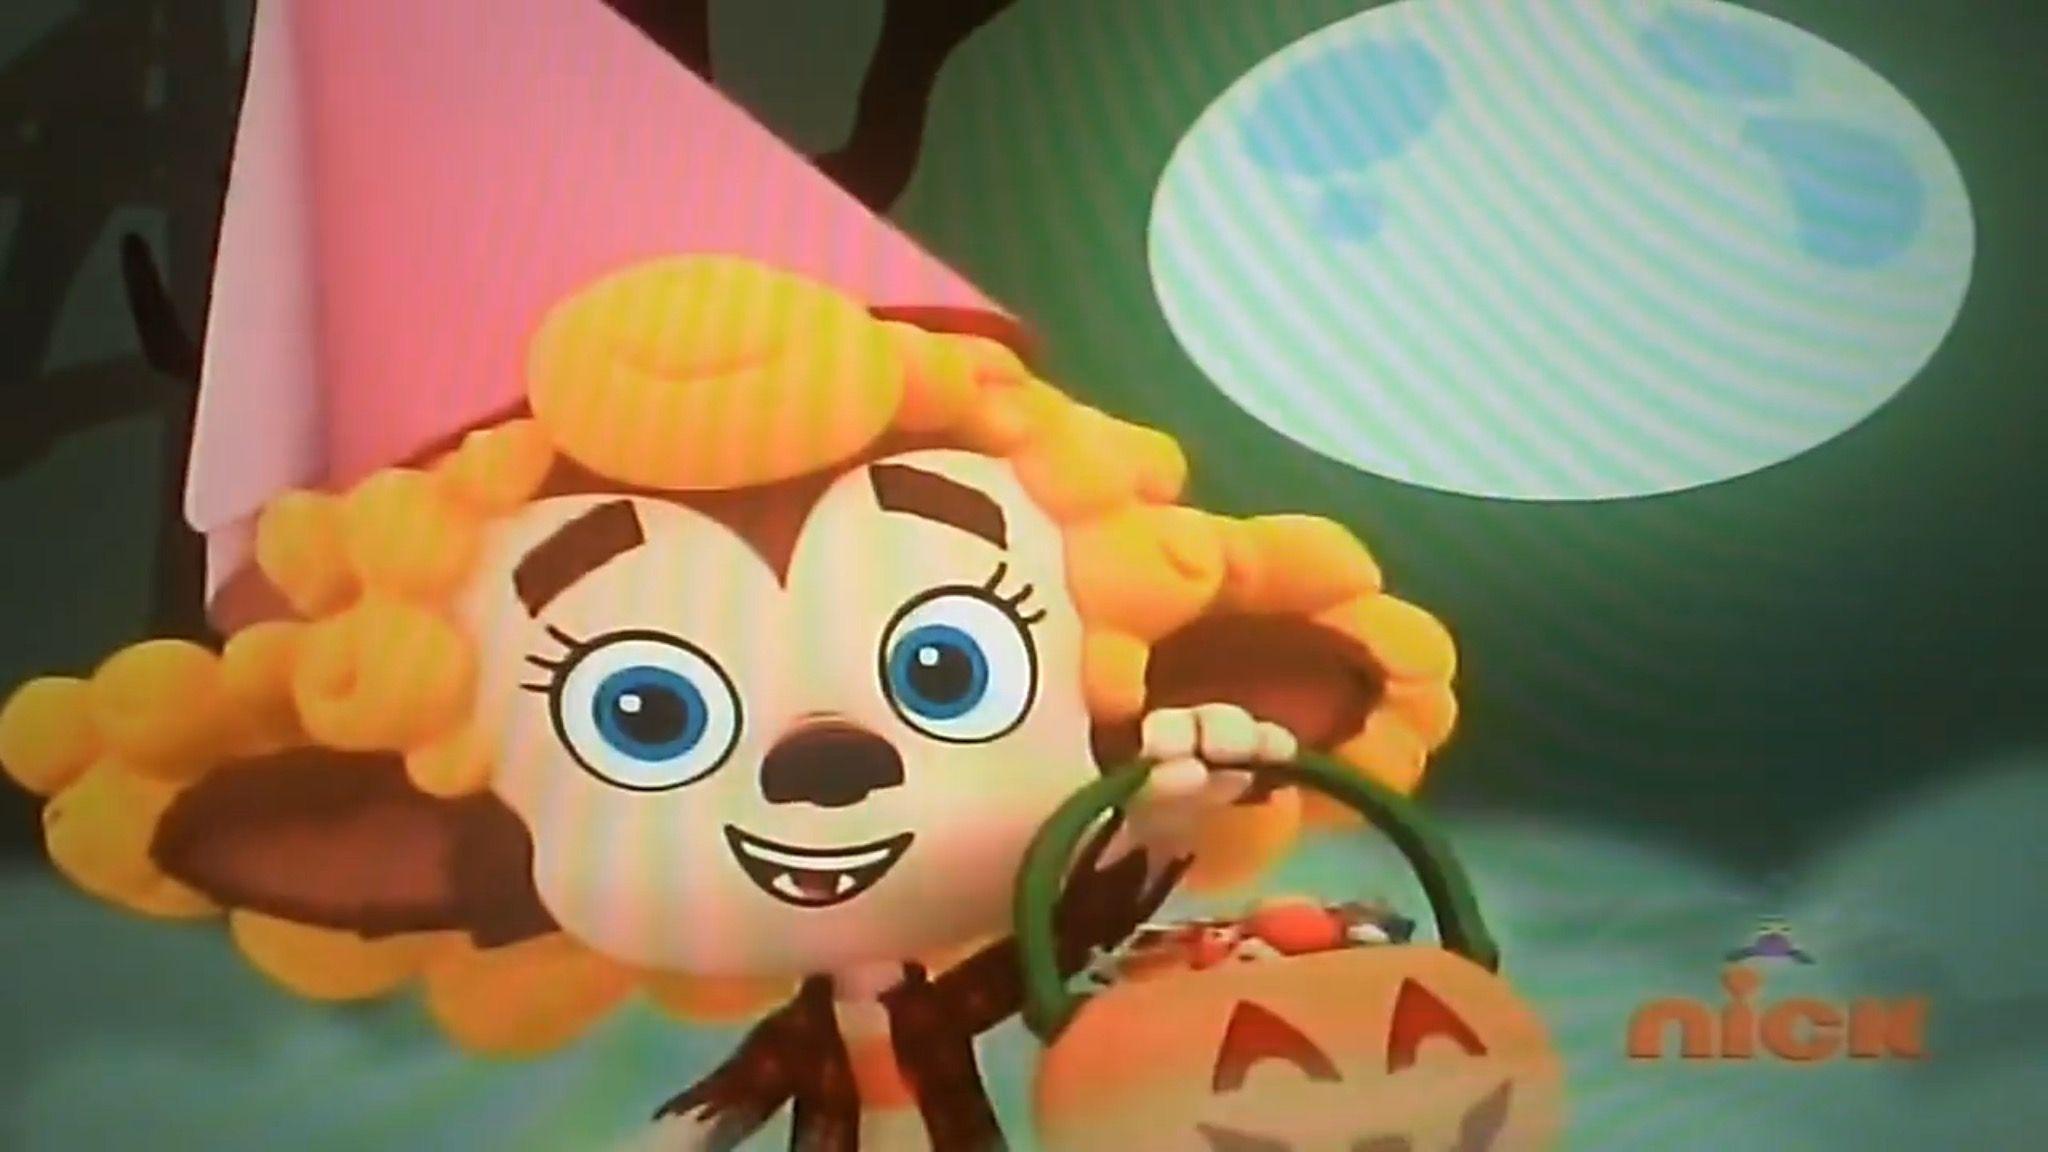 BUBBLE GUPPIES Nick jr Halloween Party - Nonny, Deema ...  |Bubble Guppies Nonny Happy